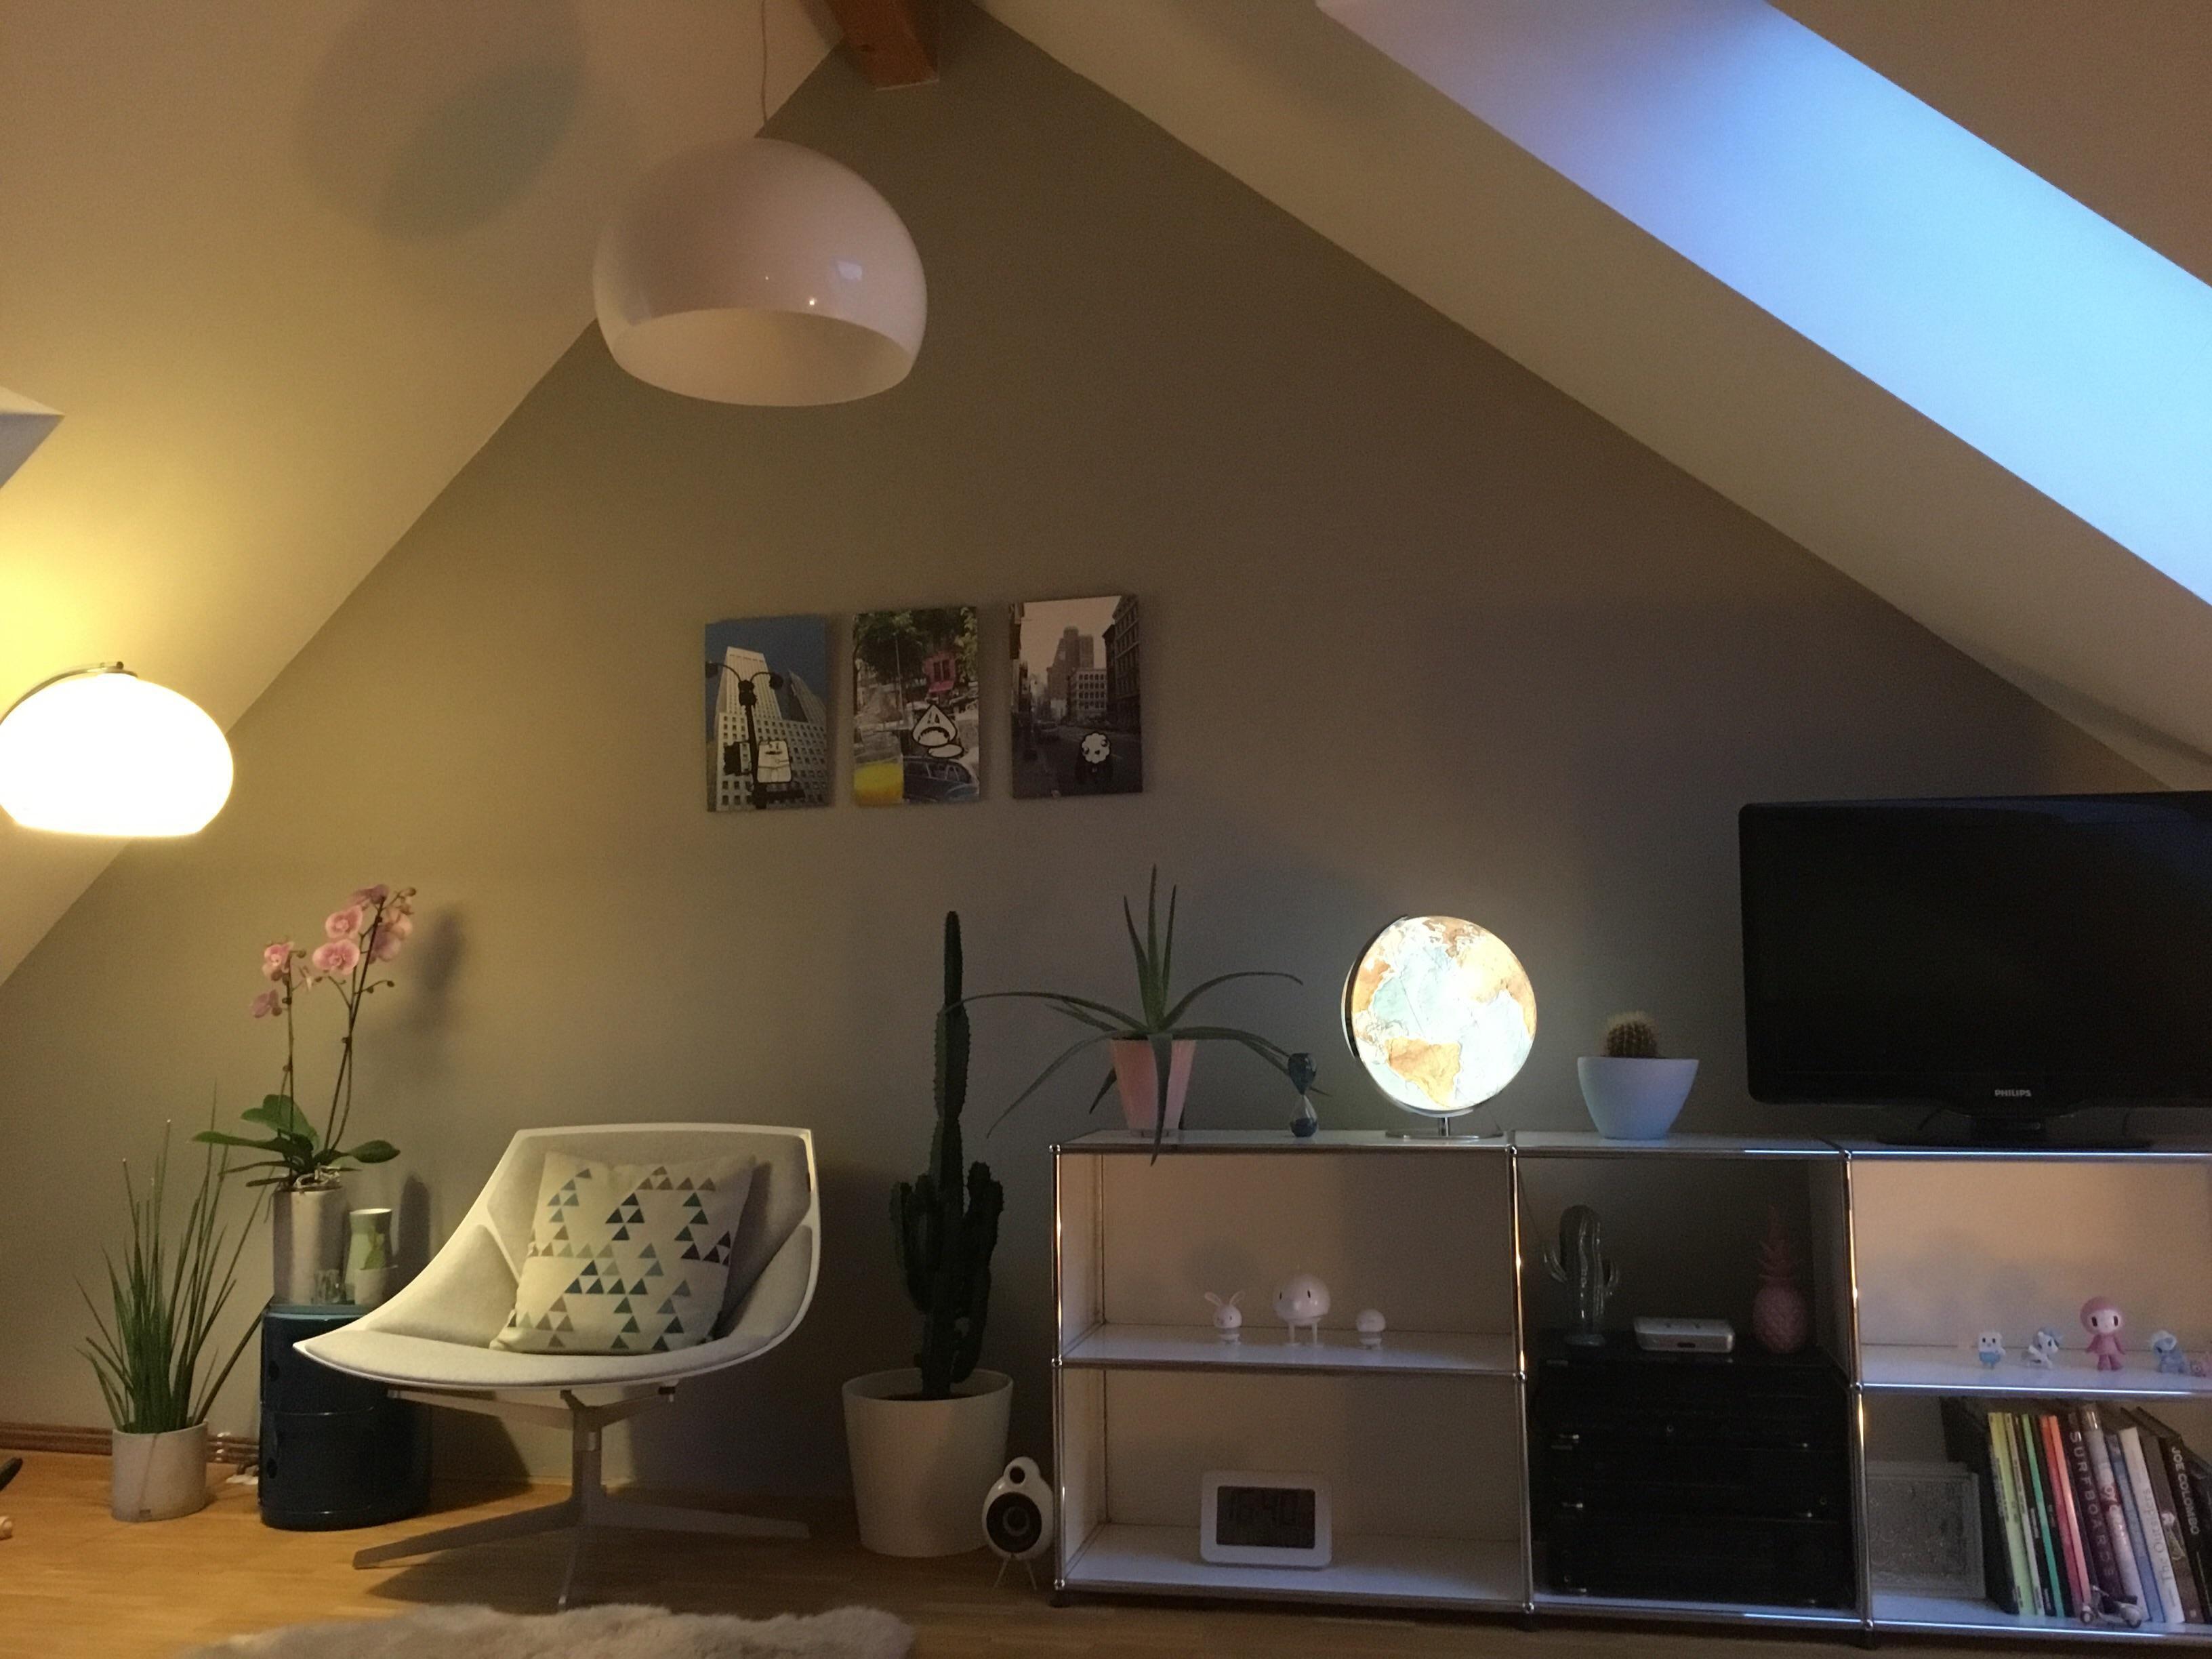 wand in steinoptik bilder ideen couchstyle. Black Bedroom Furniture Sets. Home Design Ideas